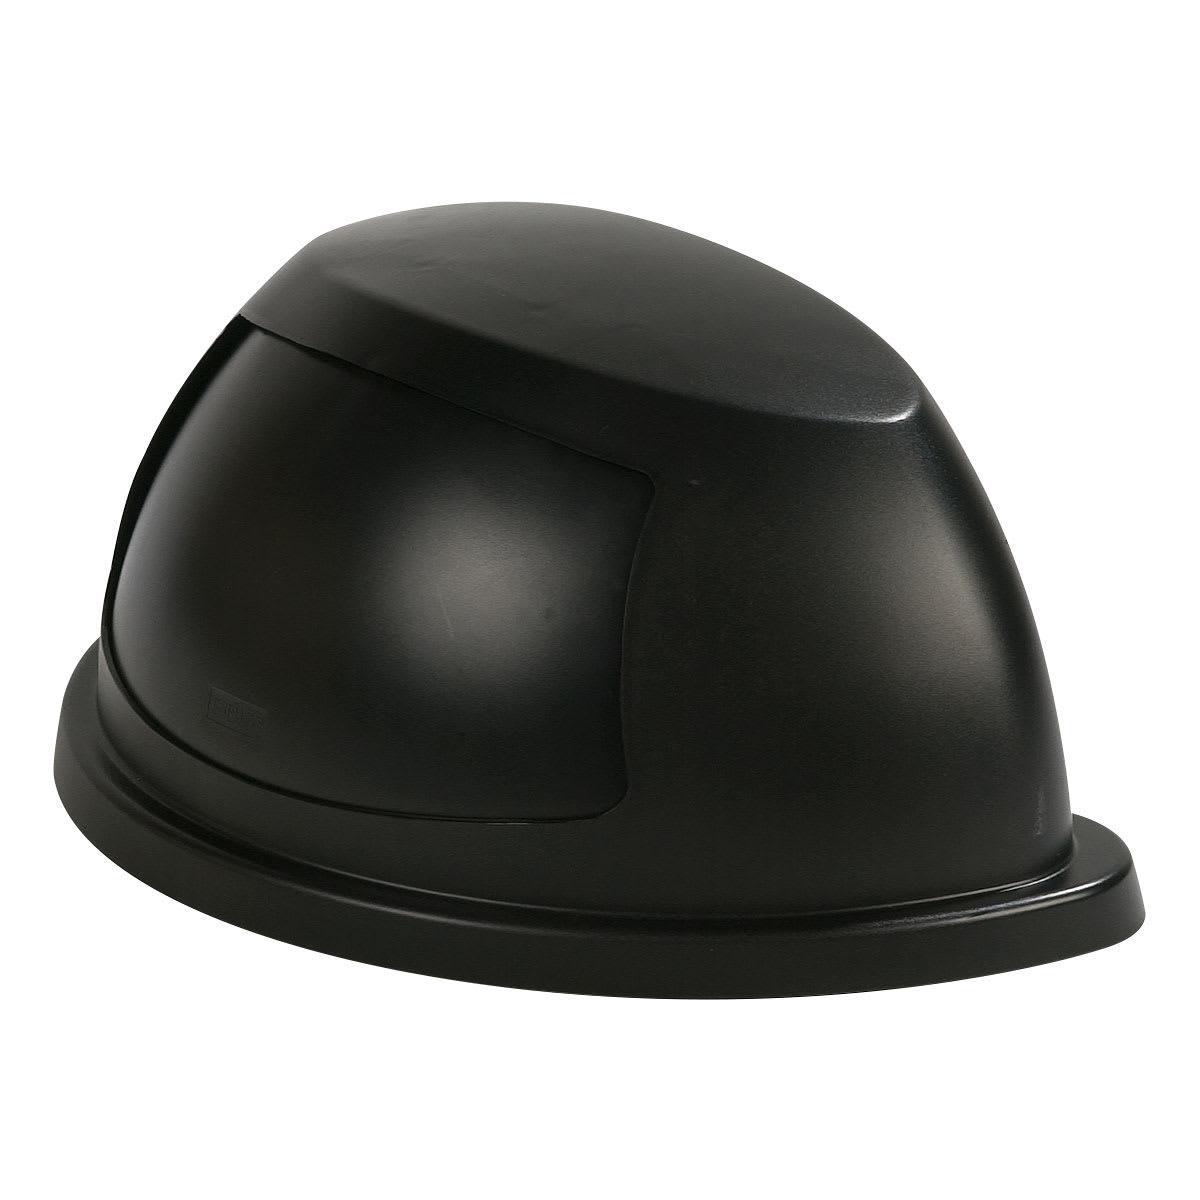 Carlisle 343022-03 Half Round Dome Trash Can Lid - Plastic, Black